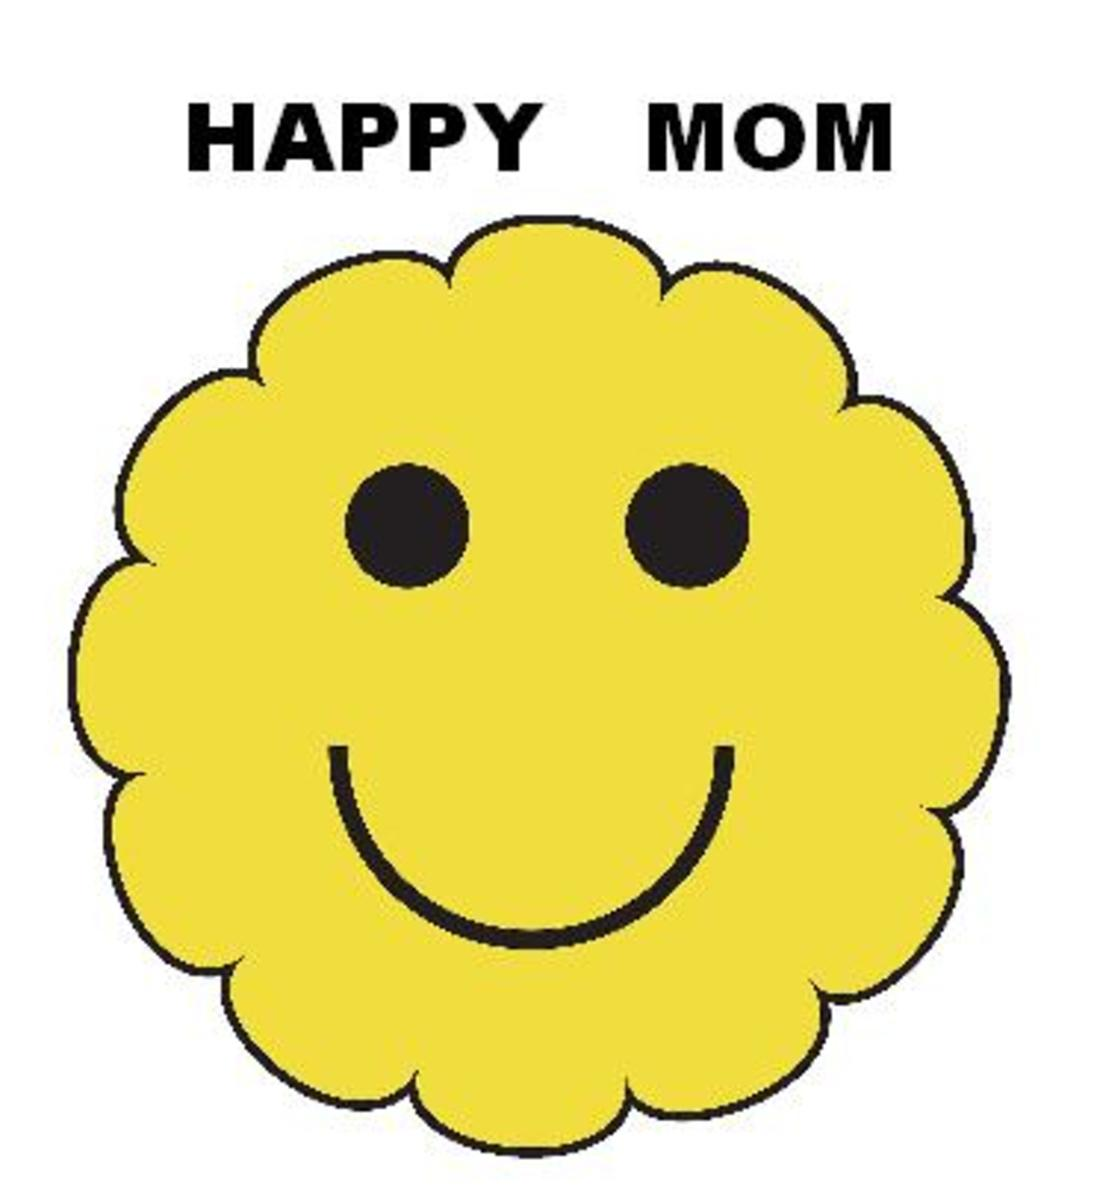 The Happy Mom Daily Checklist